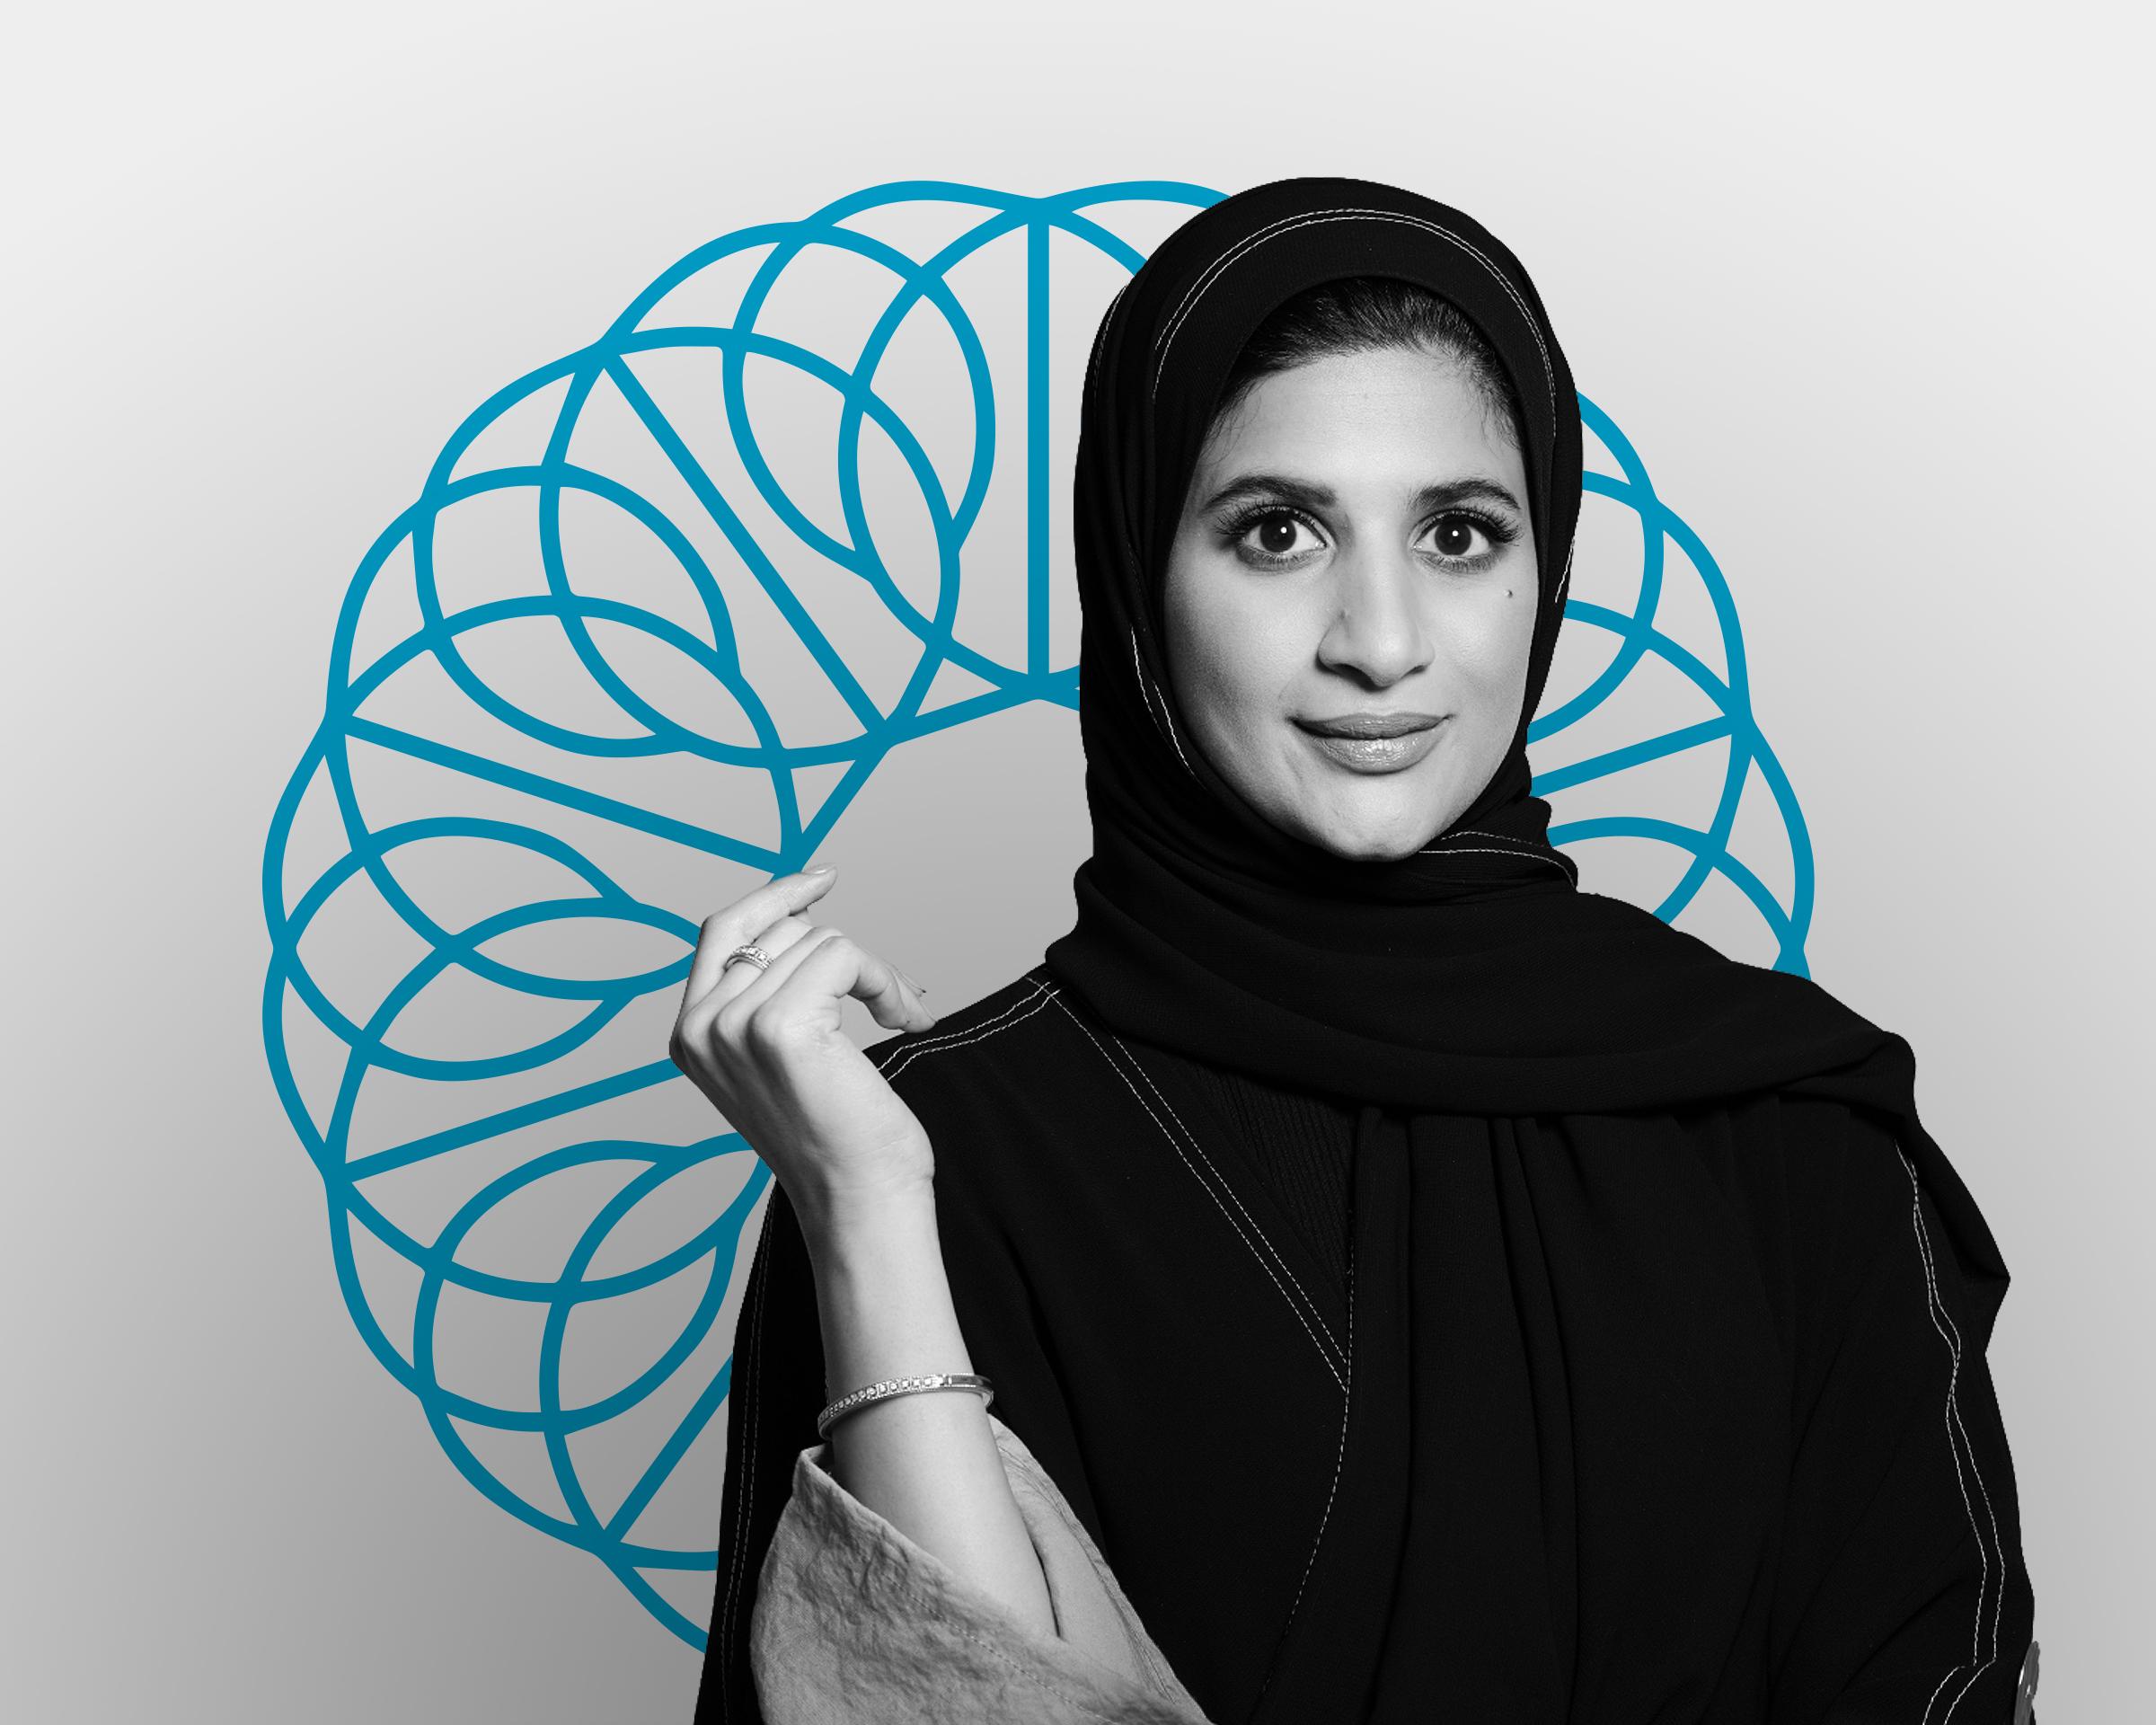 shayma j. al-sultan - 34 years oldWriter